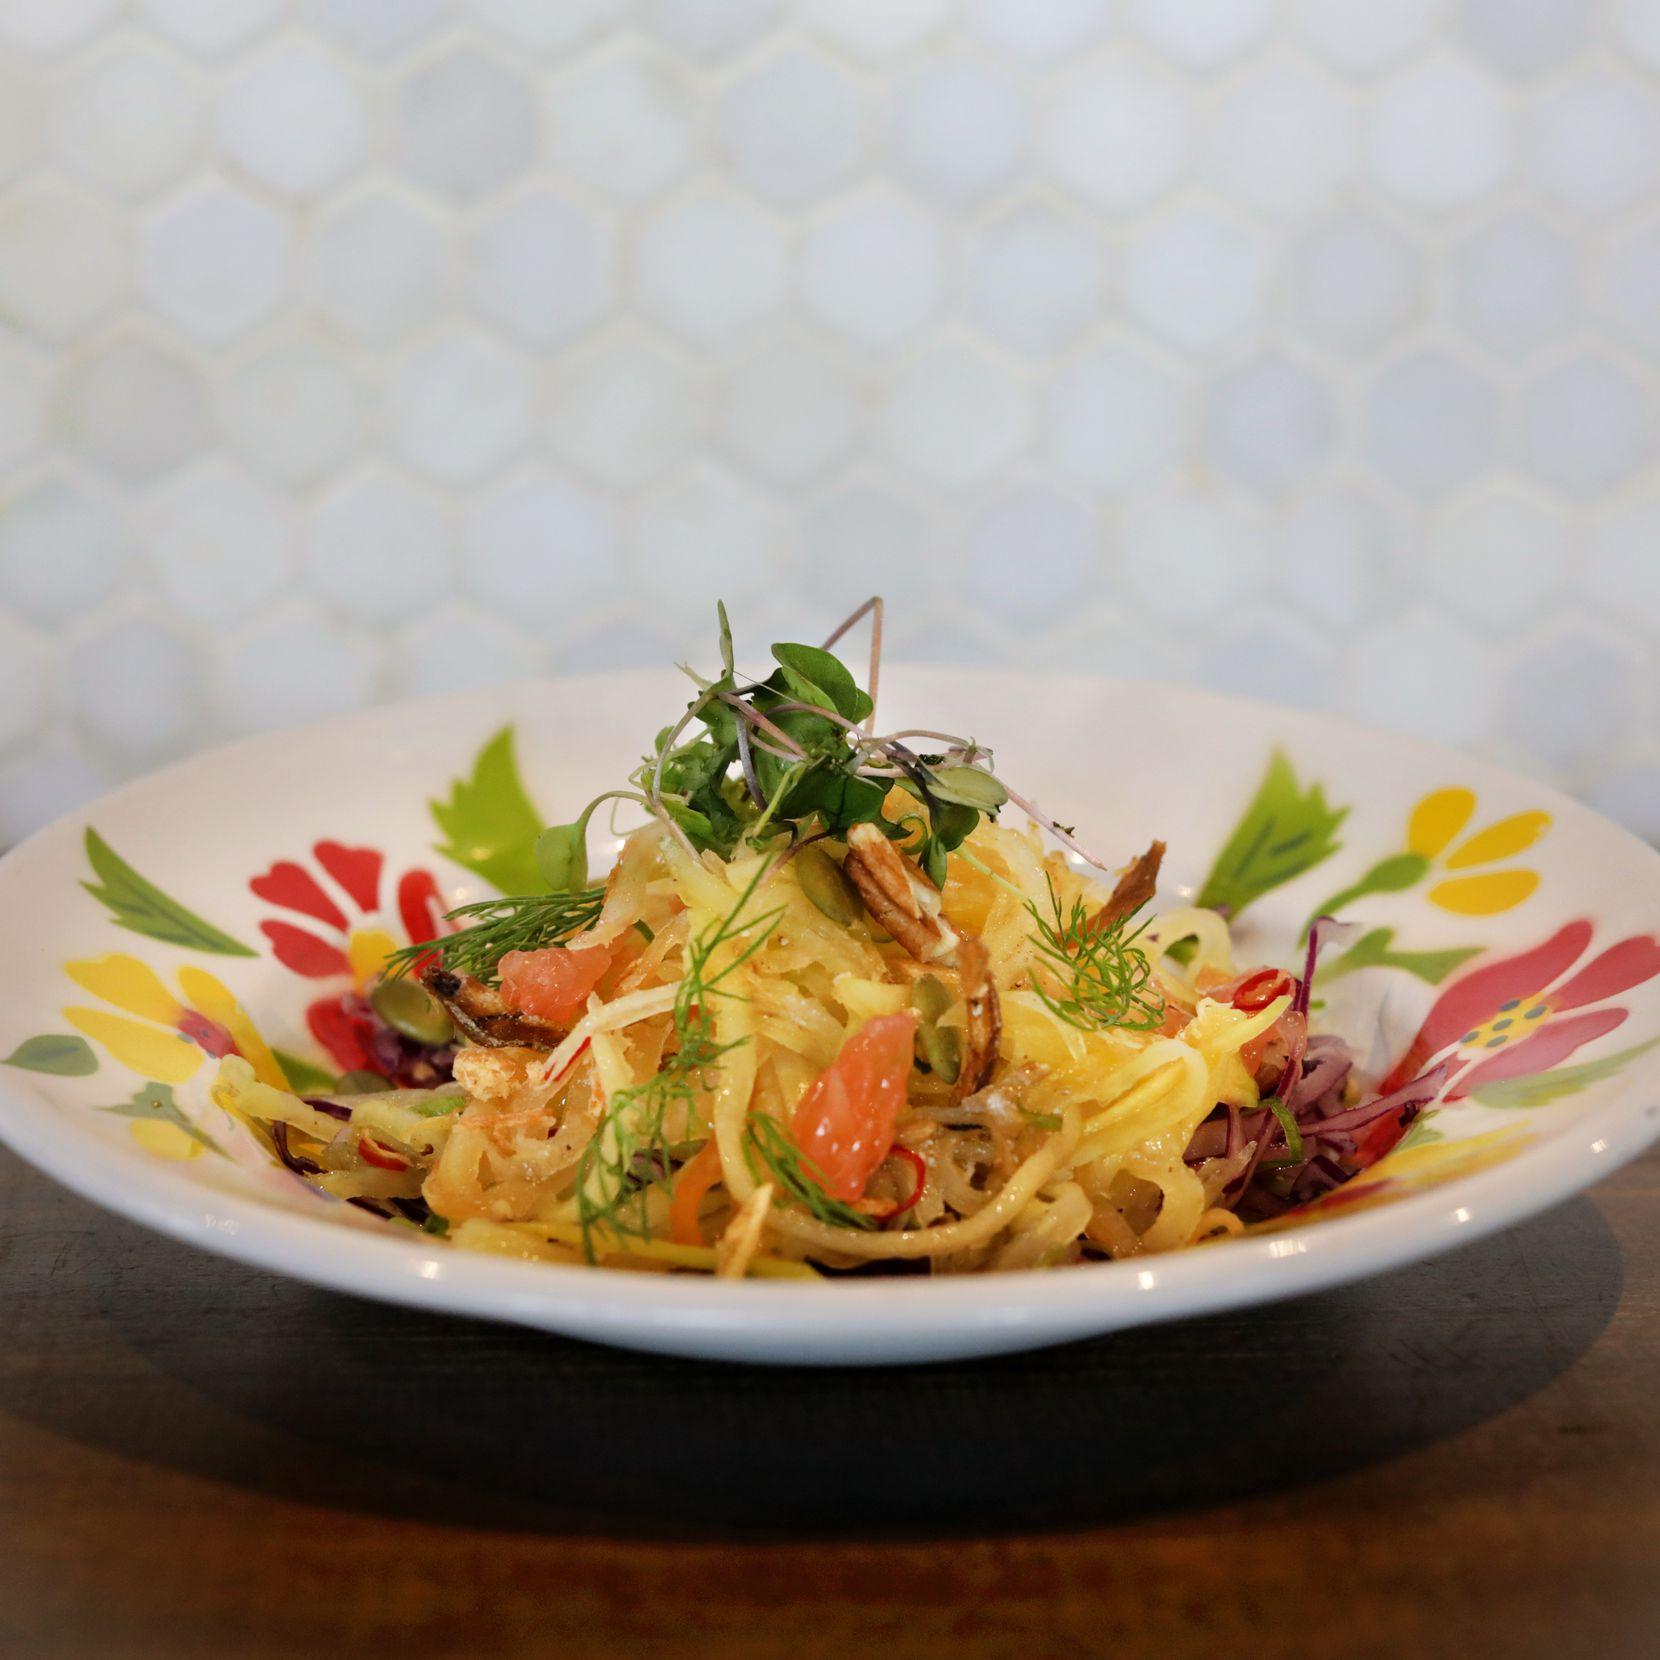 The Lao mango salad at Khao Noodle Shop